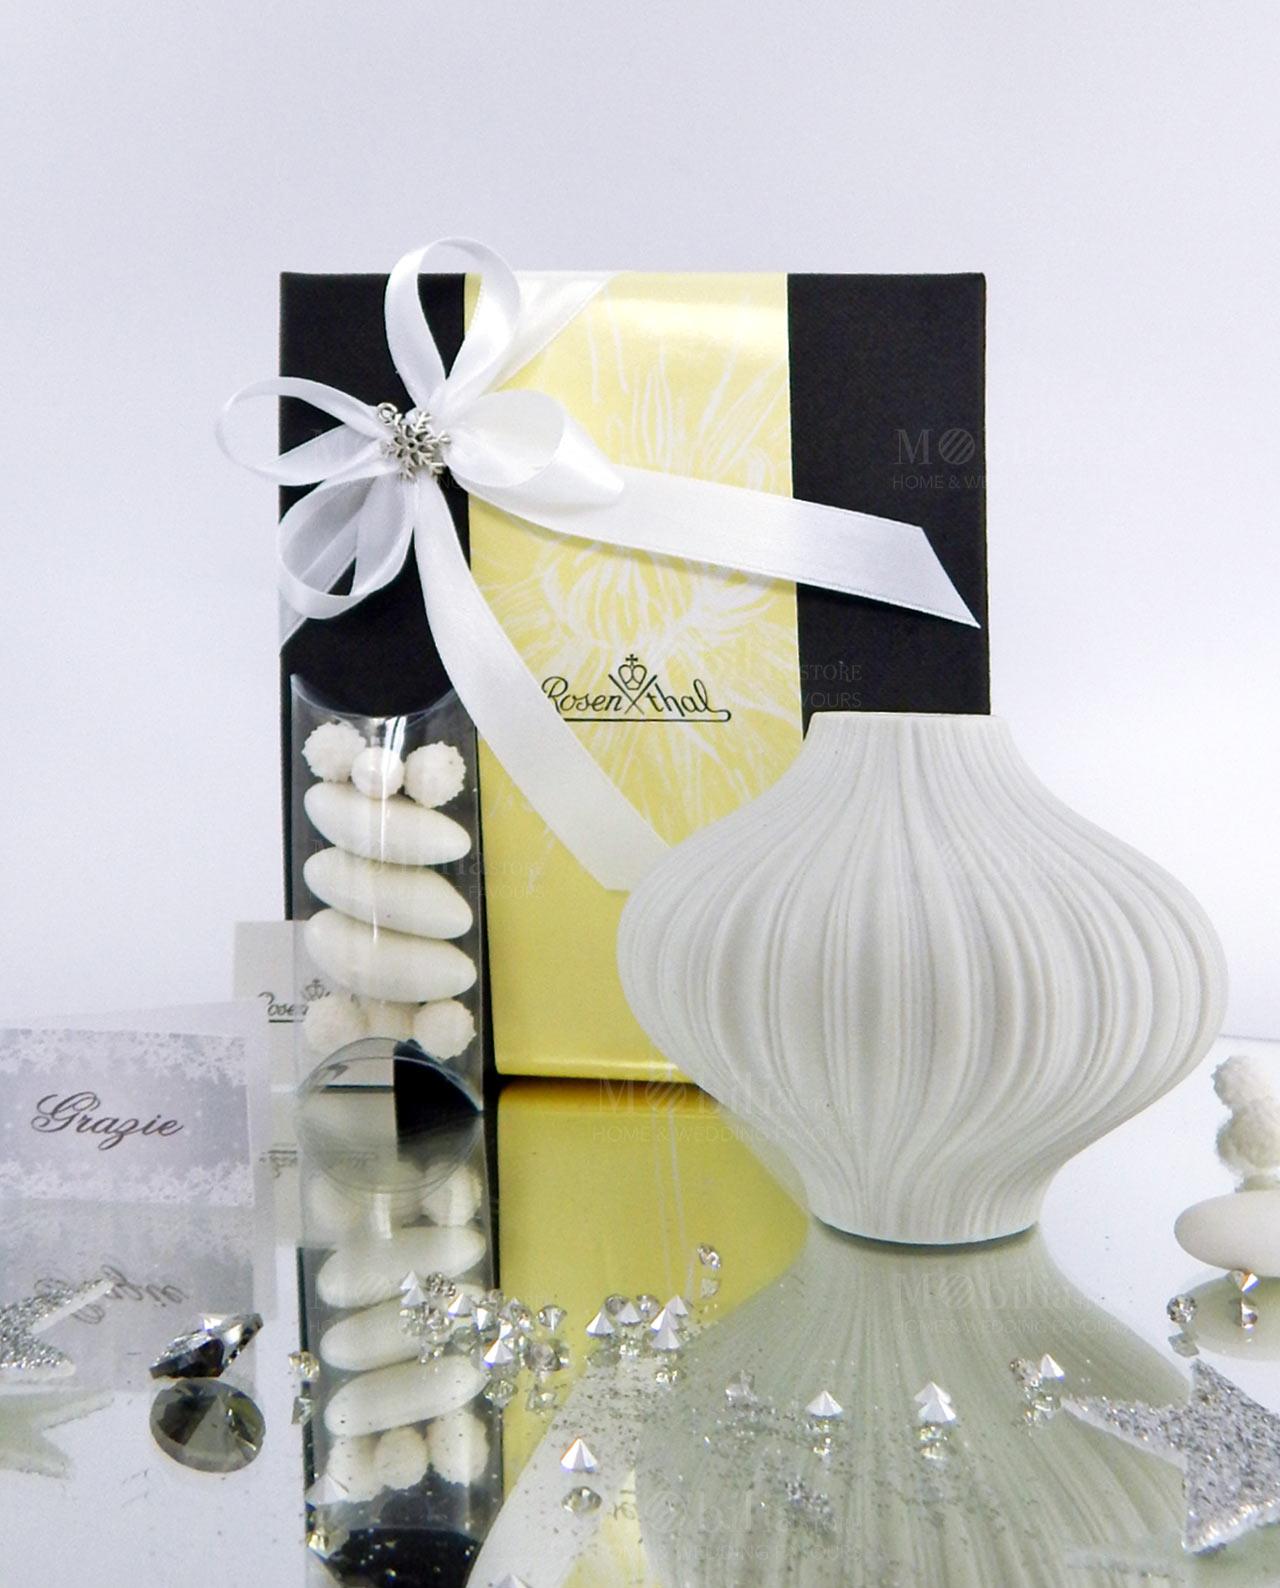 bomboniera minivaso design plisee rosenthal mobilia